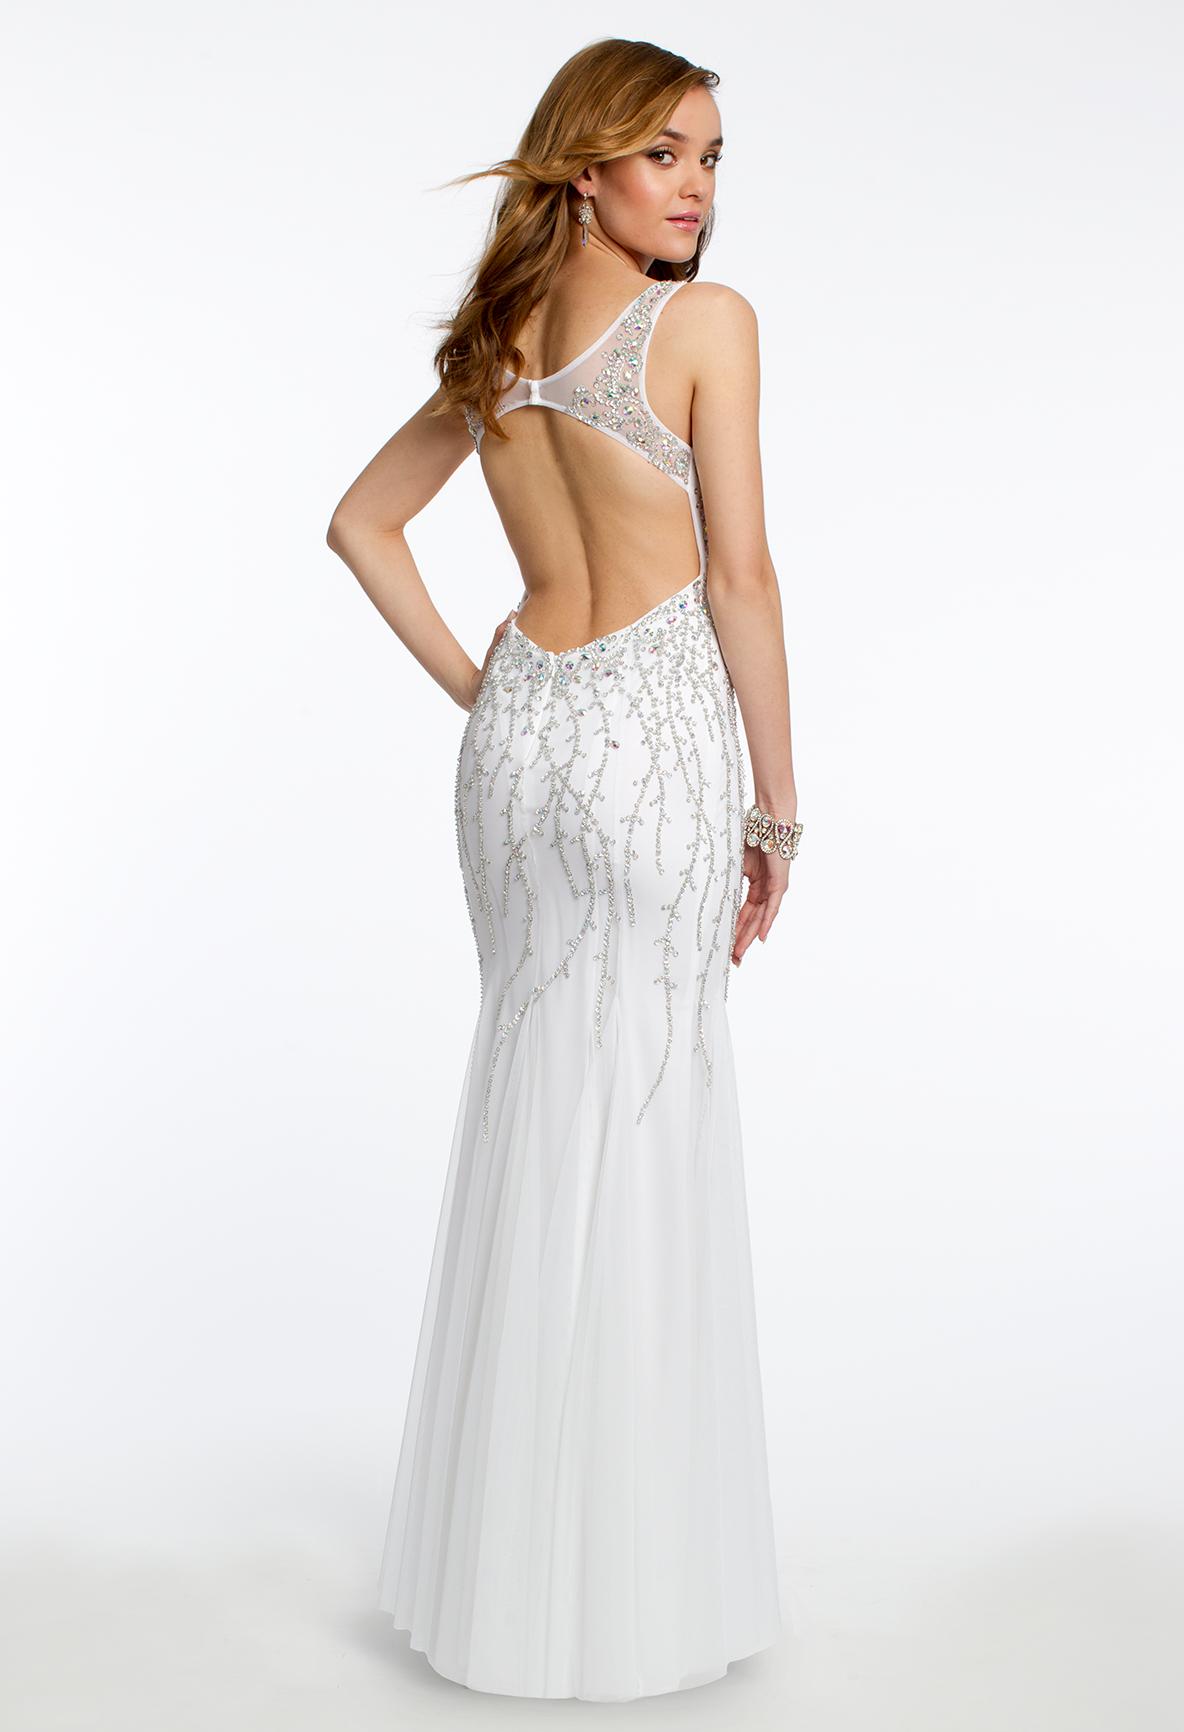 Beaded Prom Dress #camillelavie #CLVprom